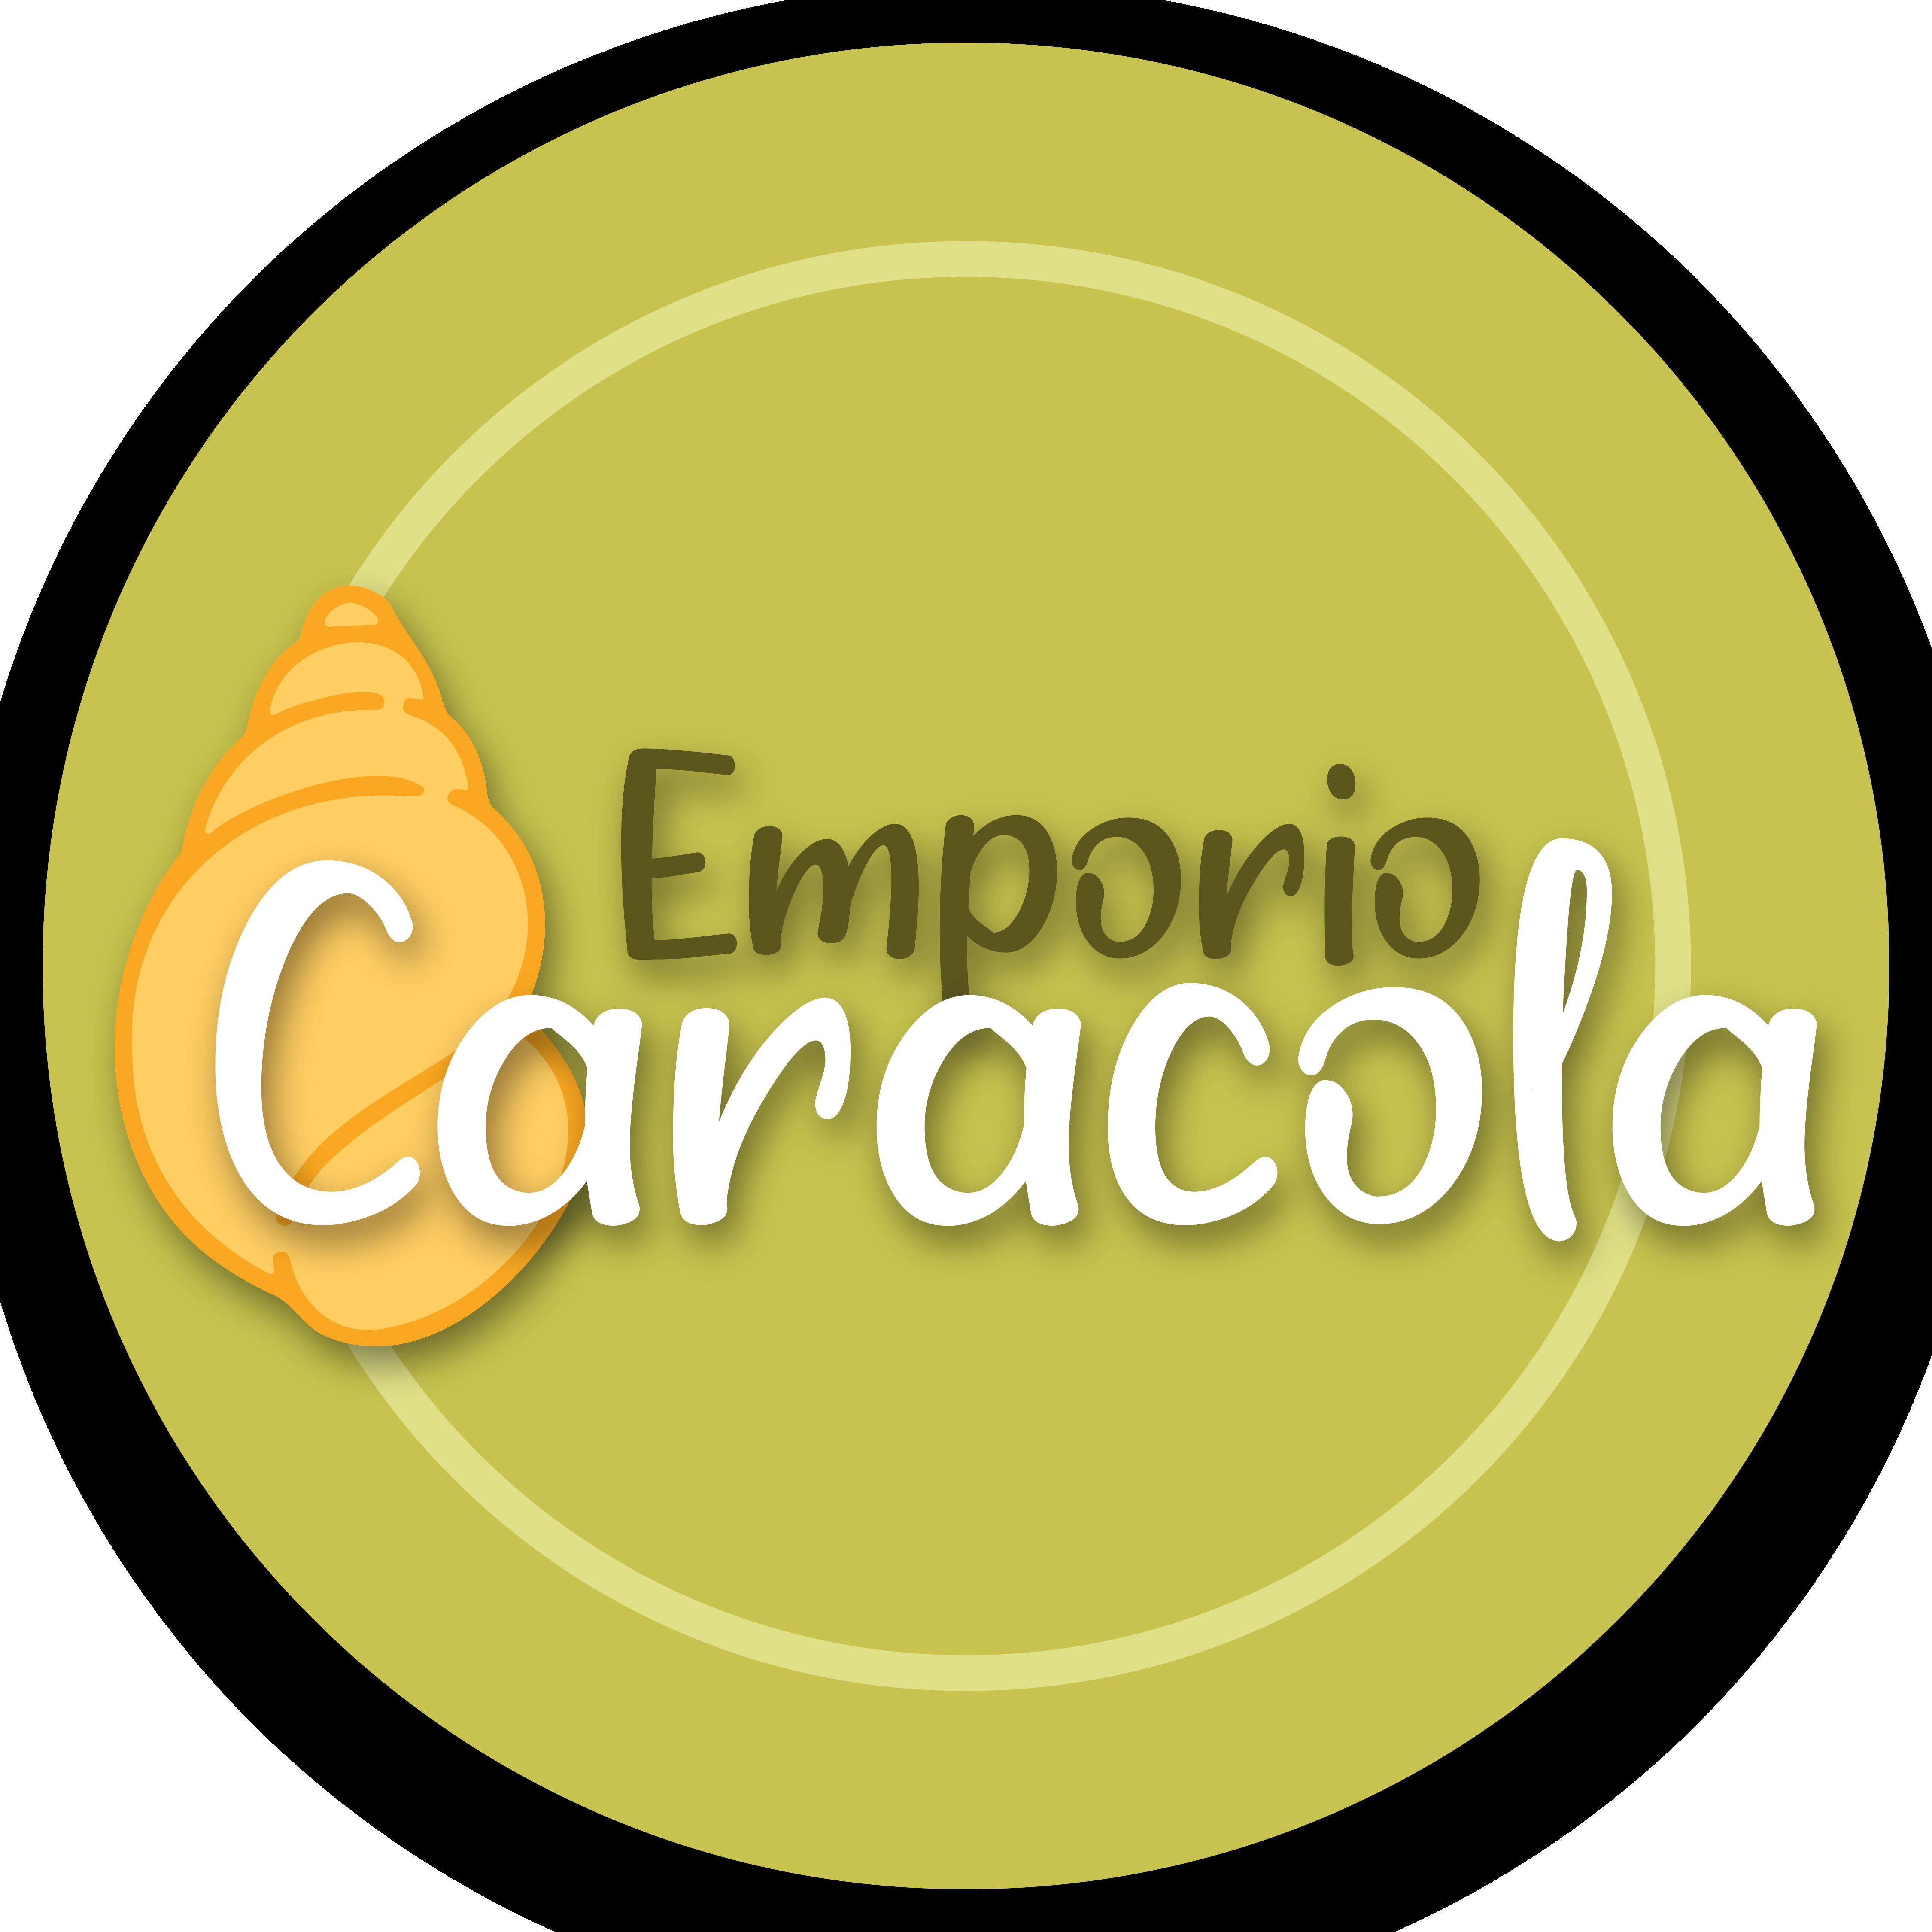 Emporio Caracola